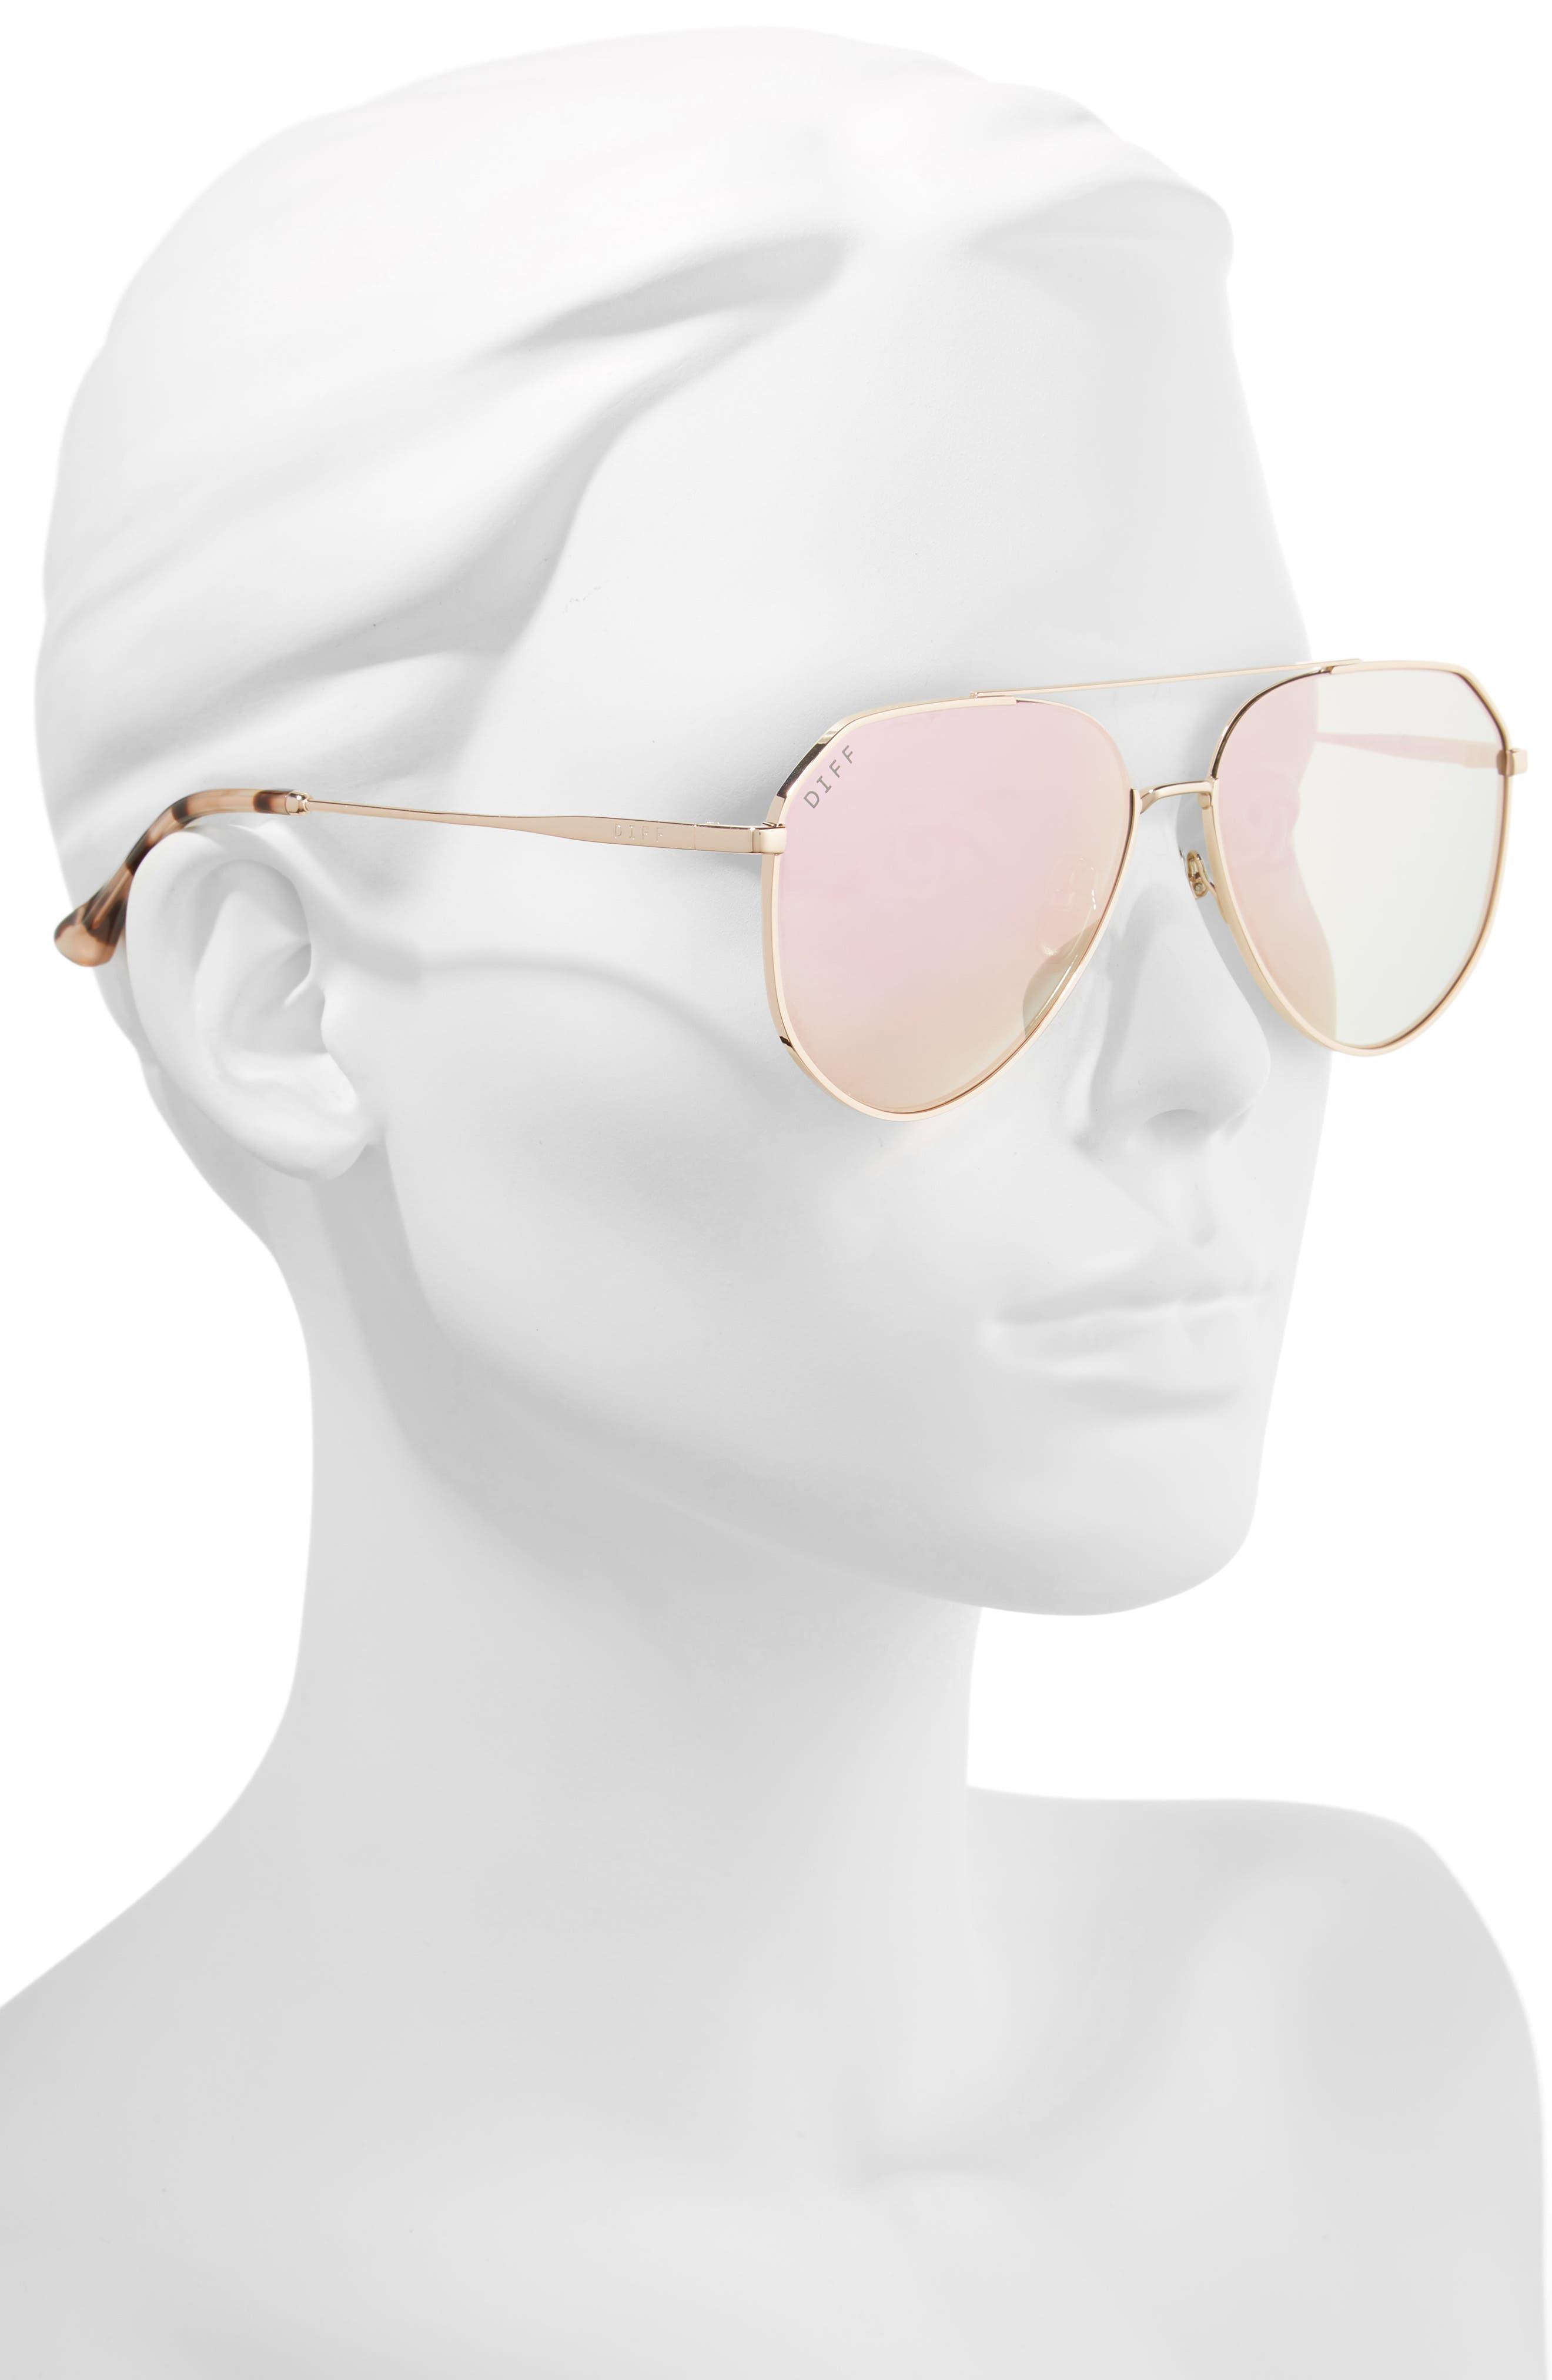 Dash 58mm Aviator Sunglasses,                             Alternate thumbnail 2, color,                             CHAMPAGNE